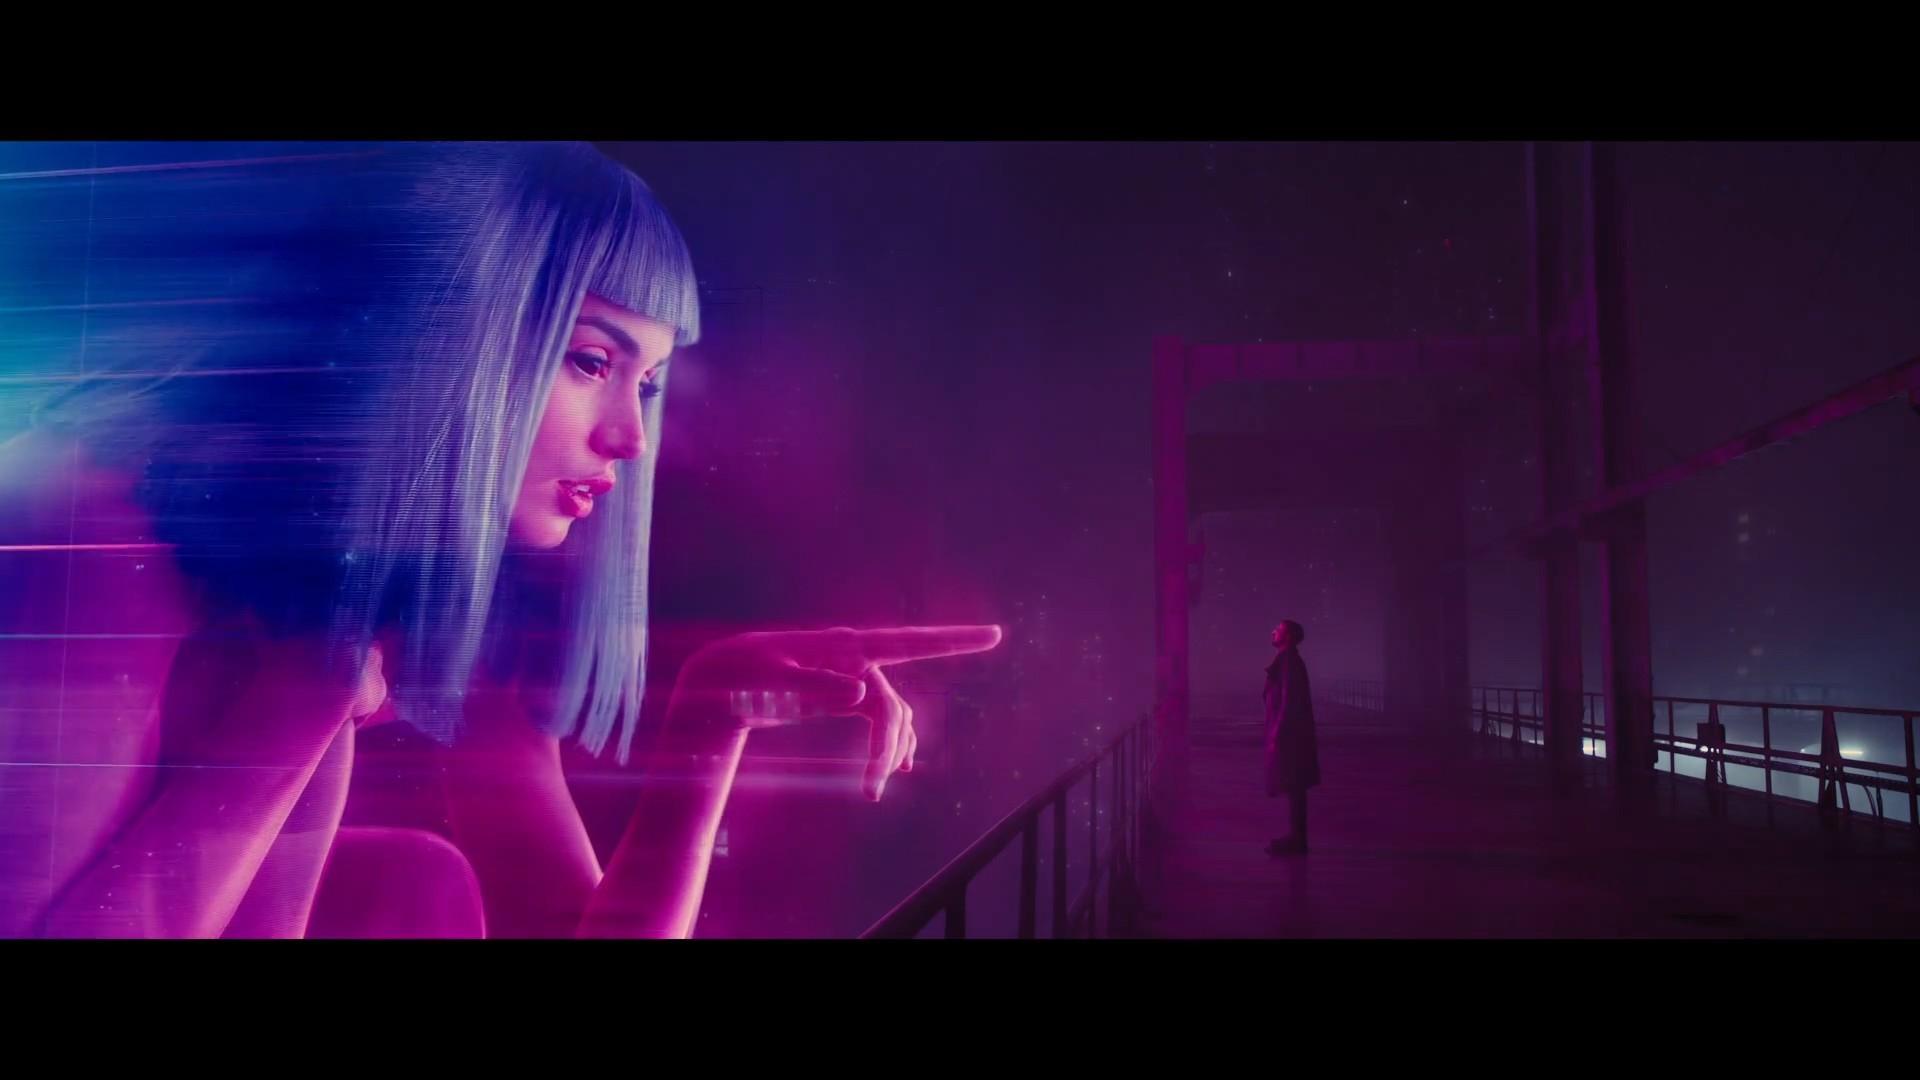 Blade Runner 2049 Wallpaper - KoLPaPer - Awesome Free HD ...